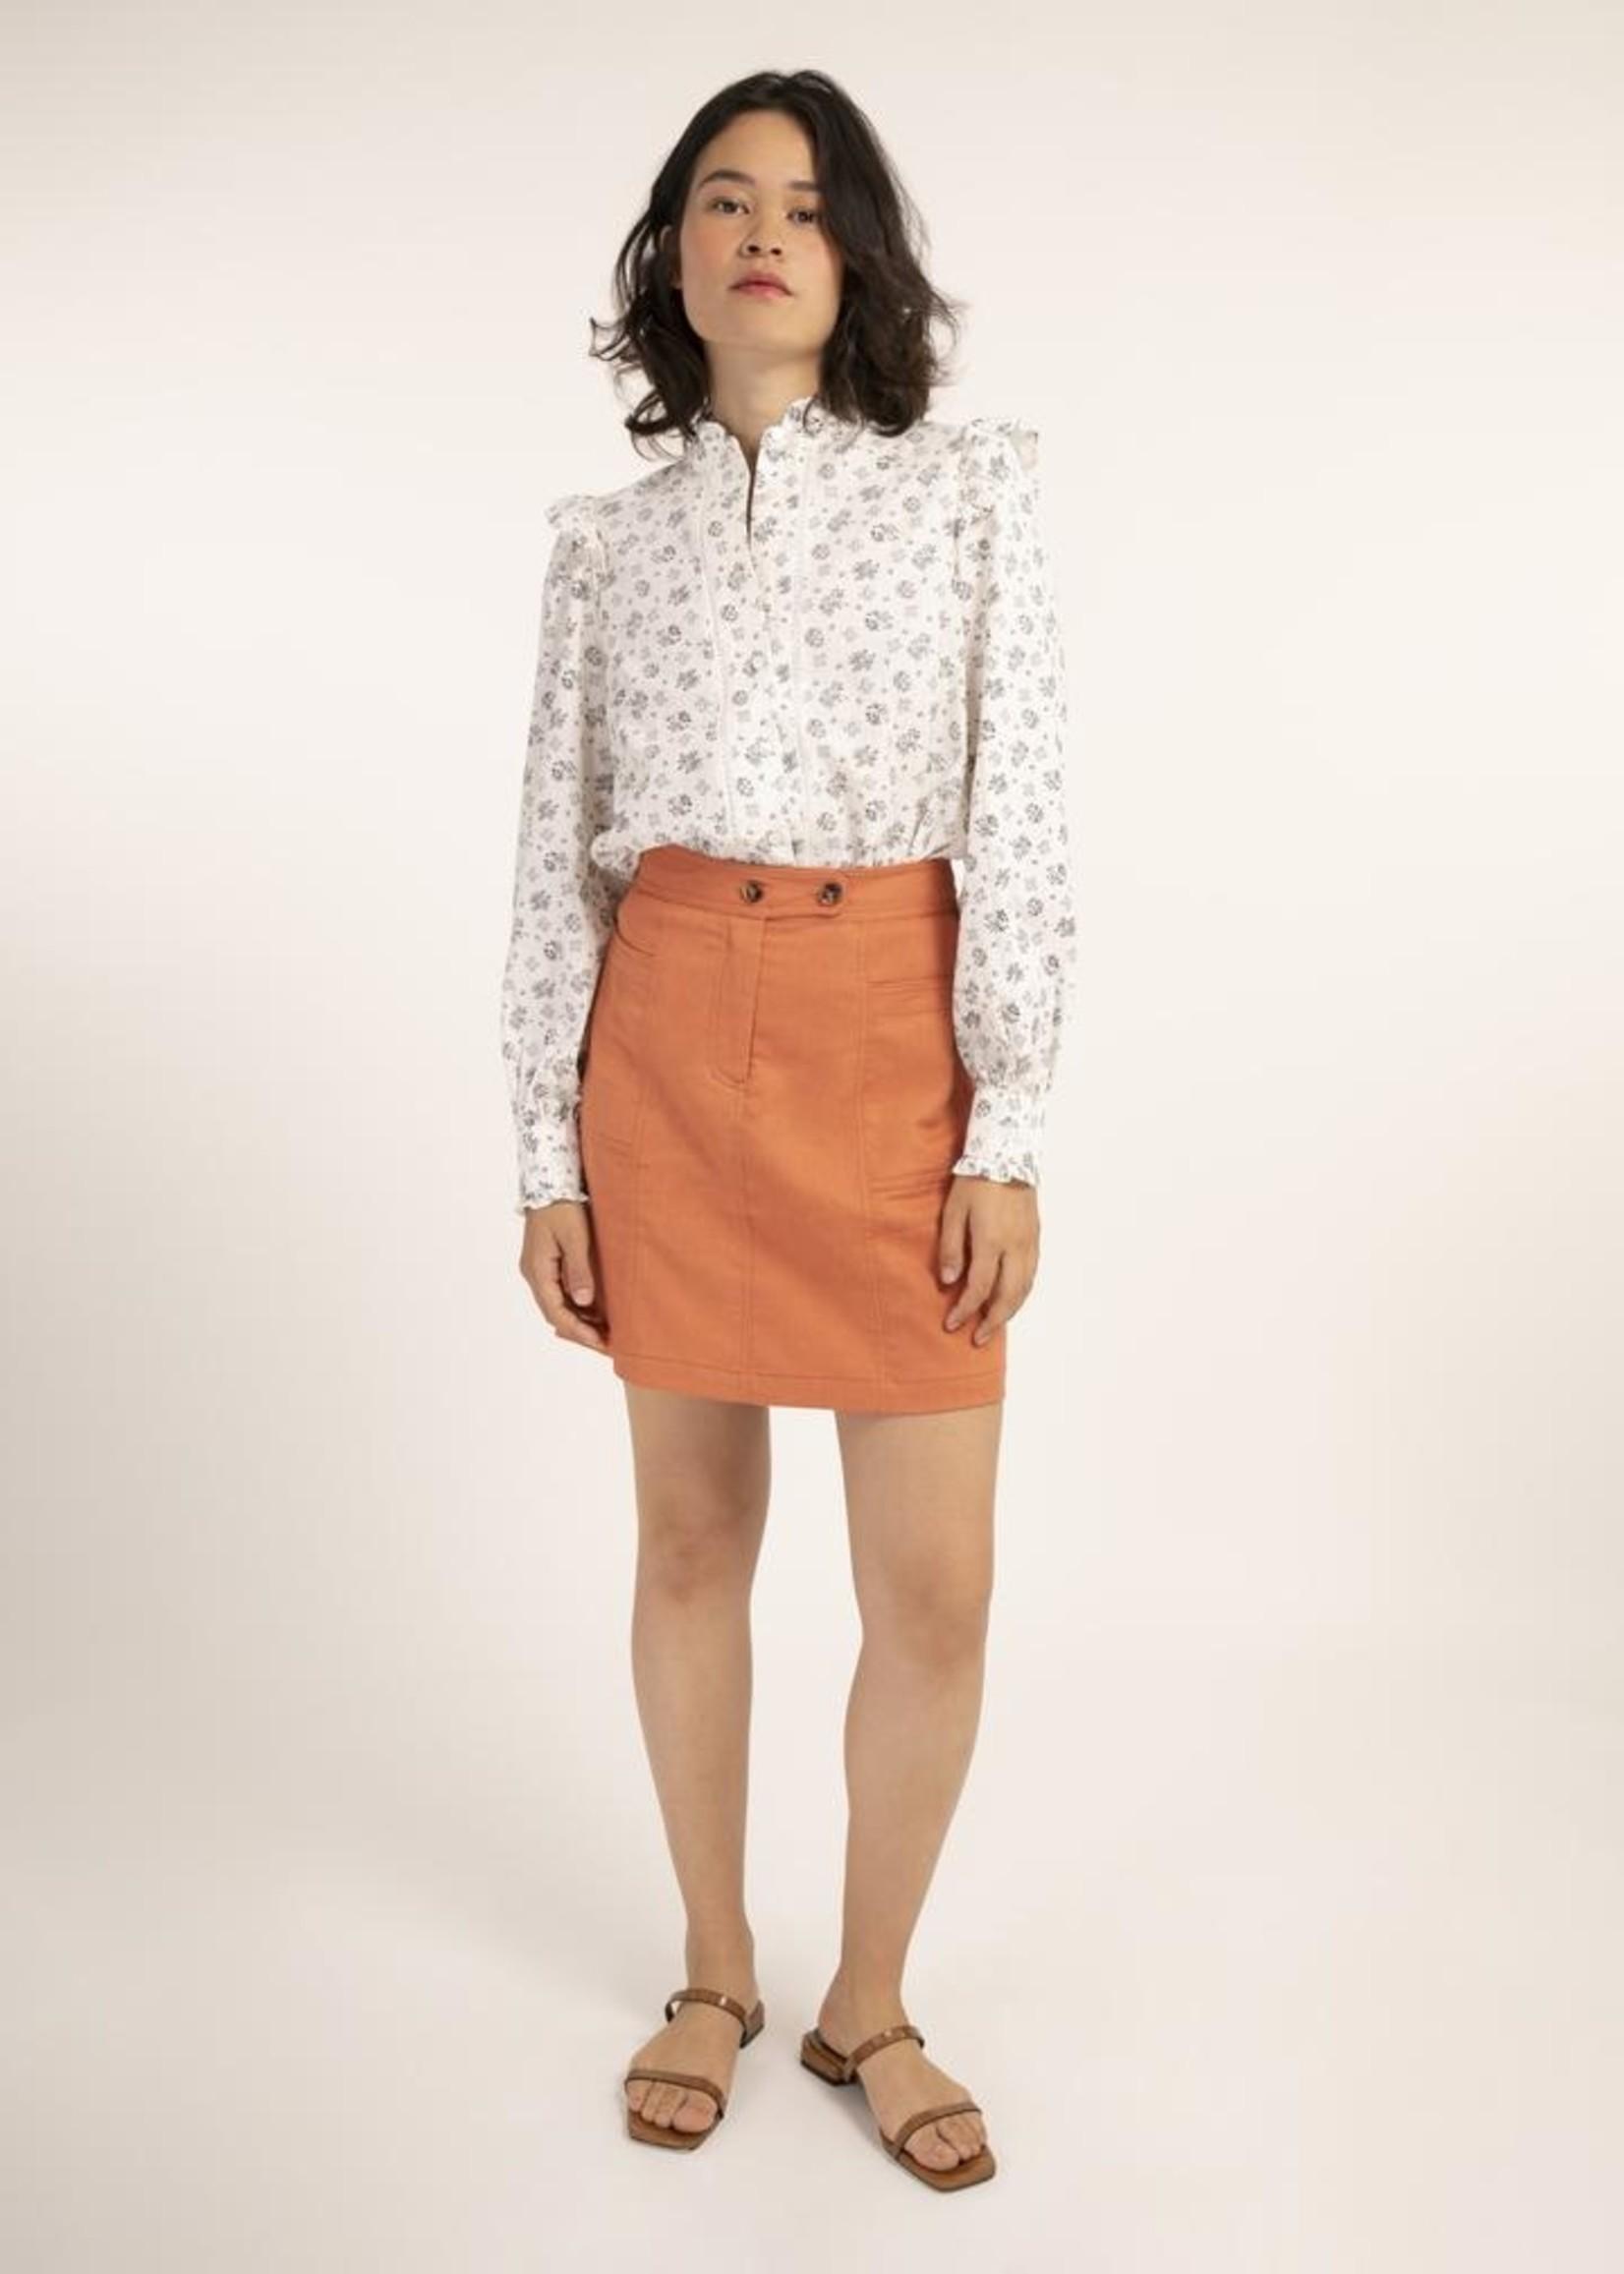 Elitaire Boutique Elymus Skirt in Brick